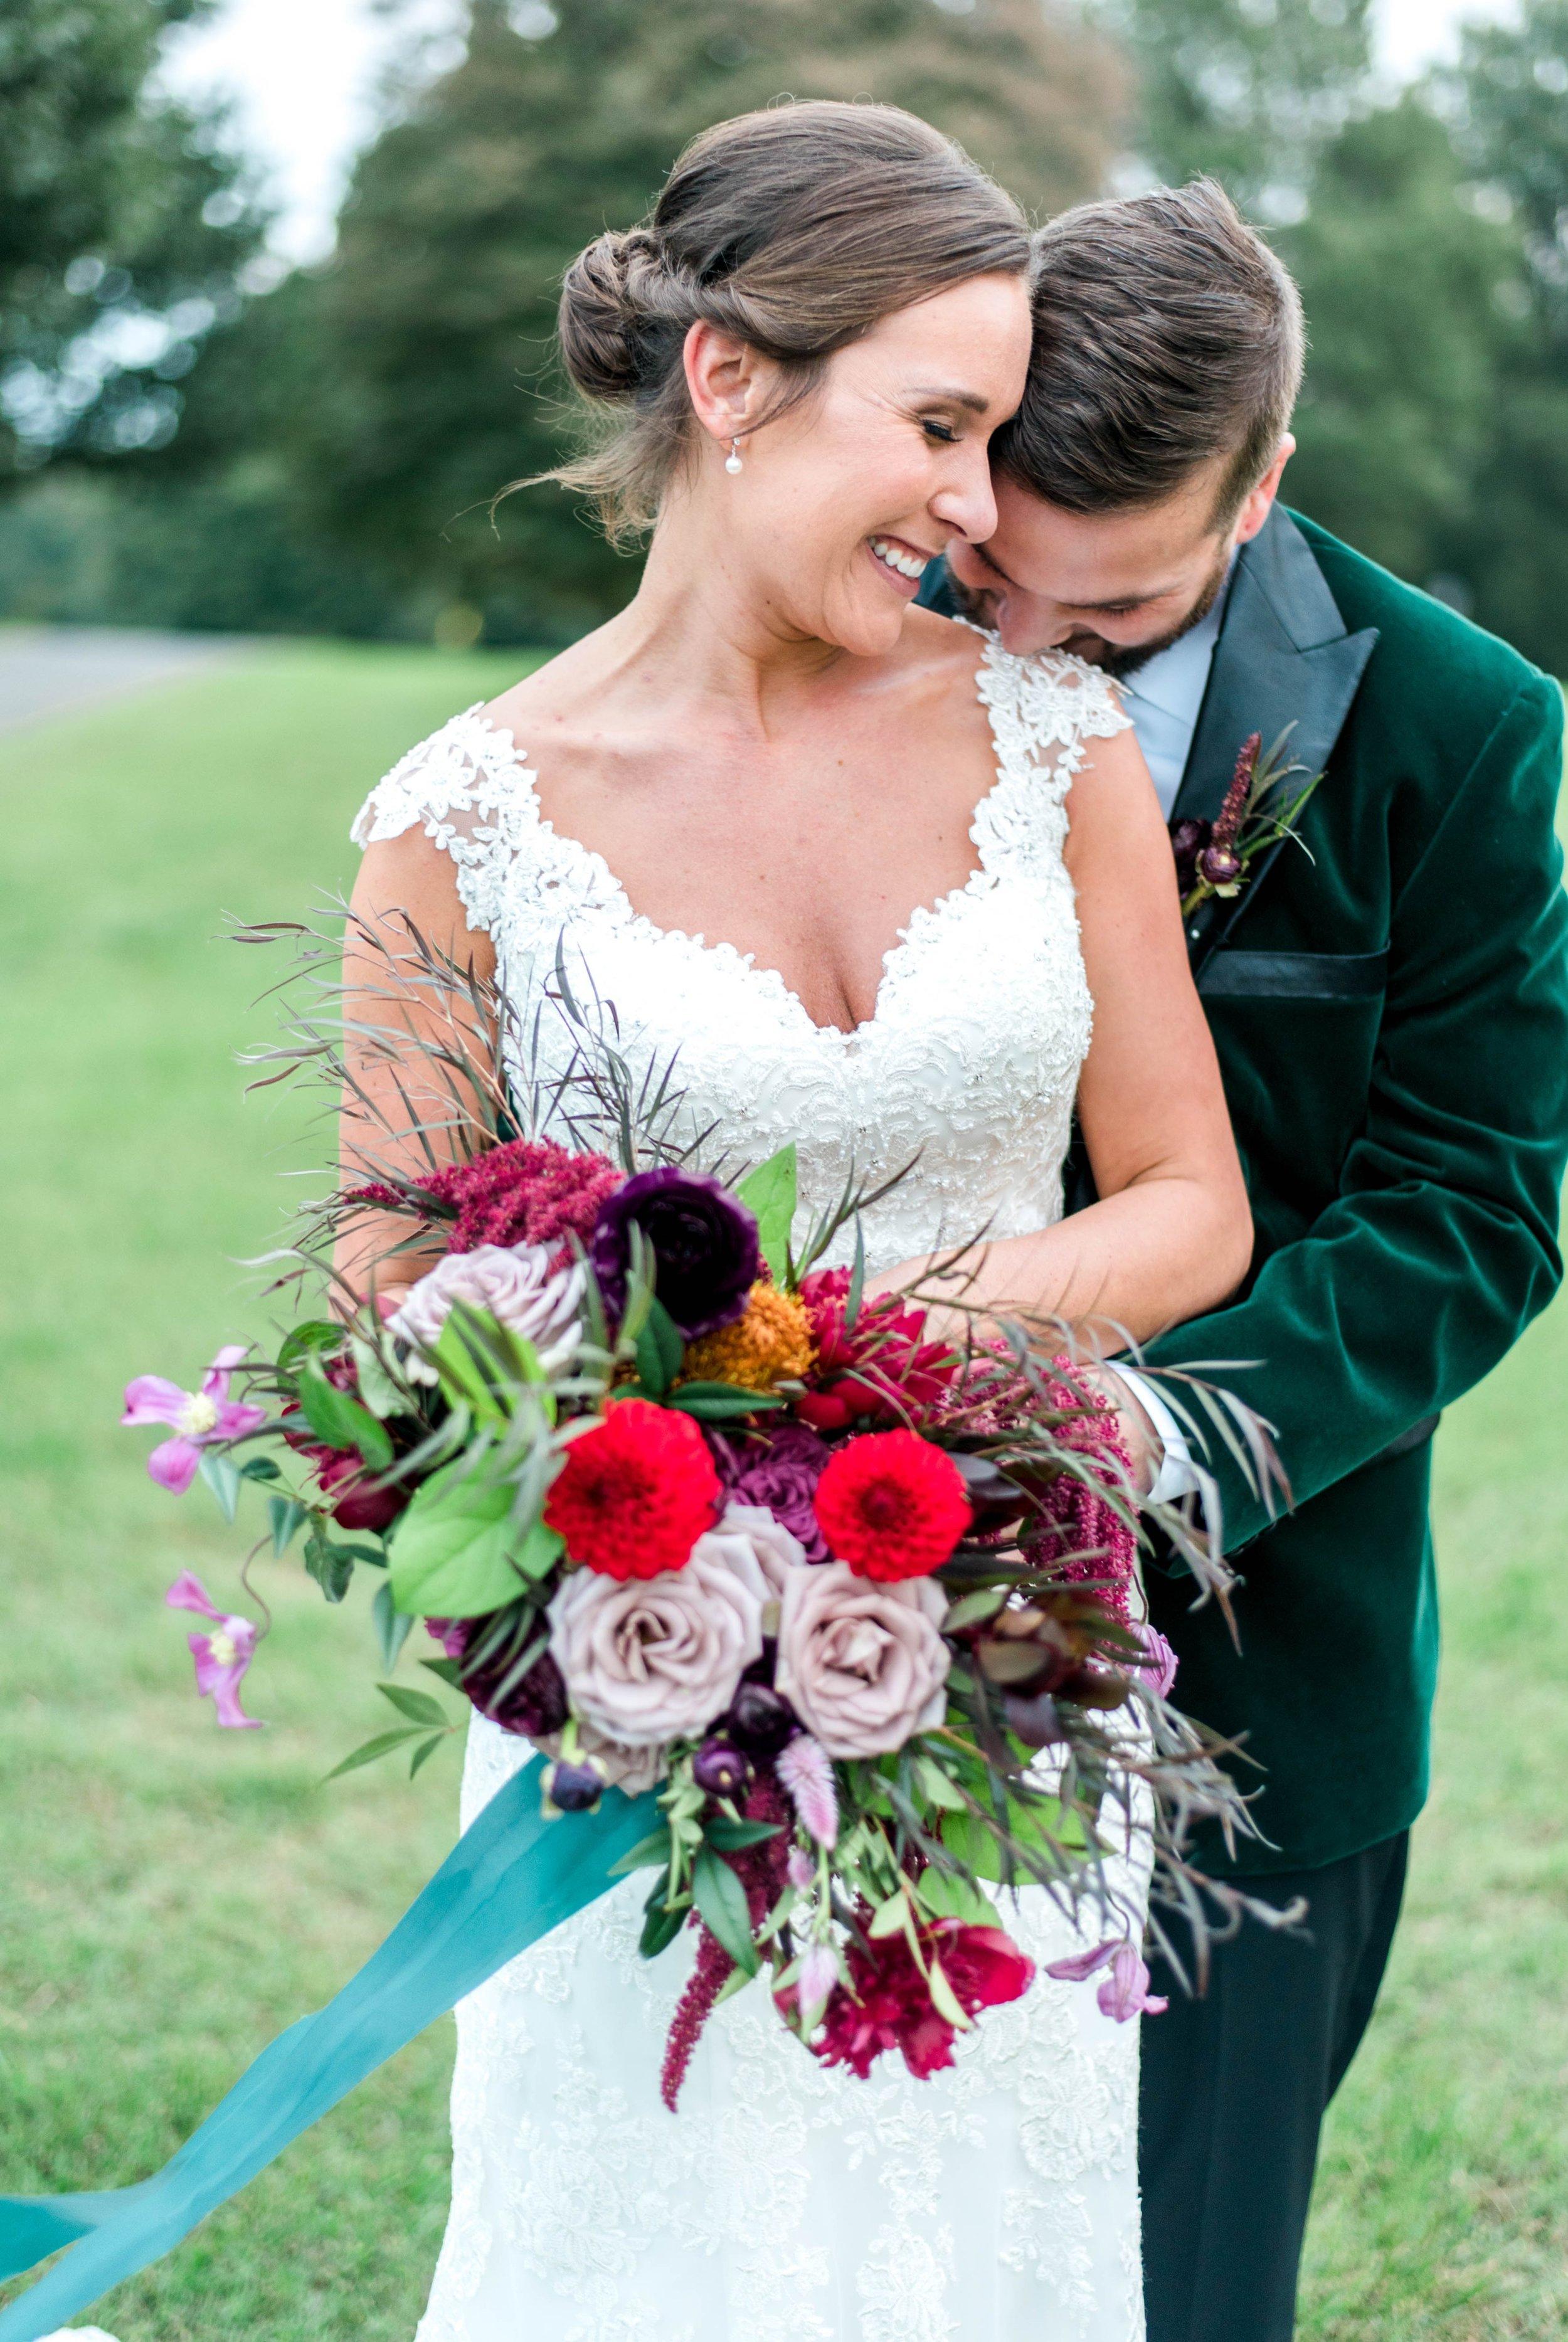 Gordan+Lauren_BoonsboroCountryClubWedding_Virginiaweddingphotographer_LynchburgVi 30.jpg